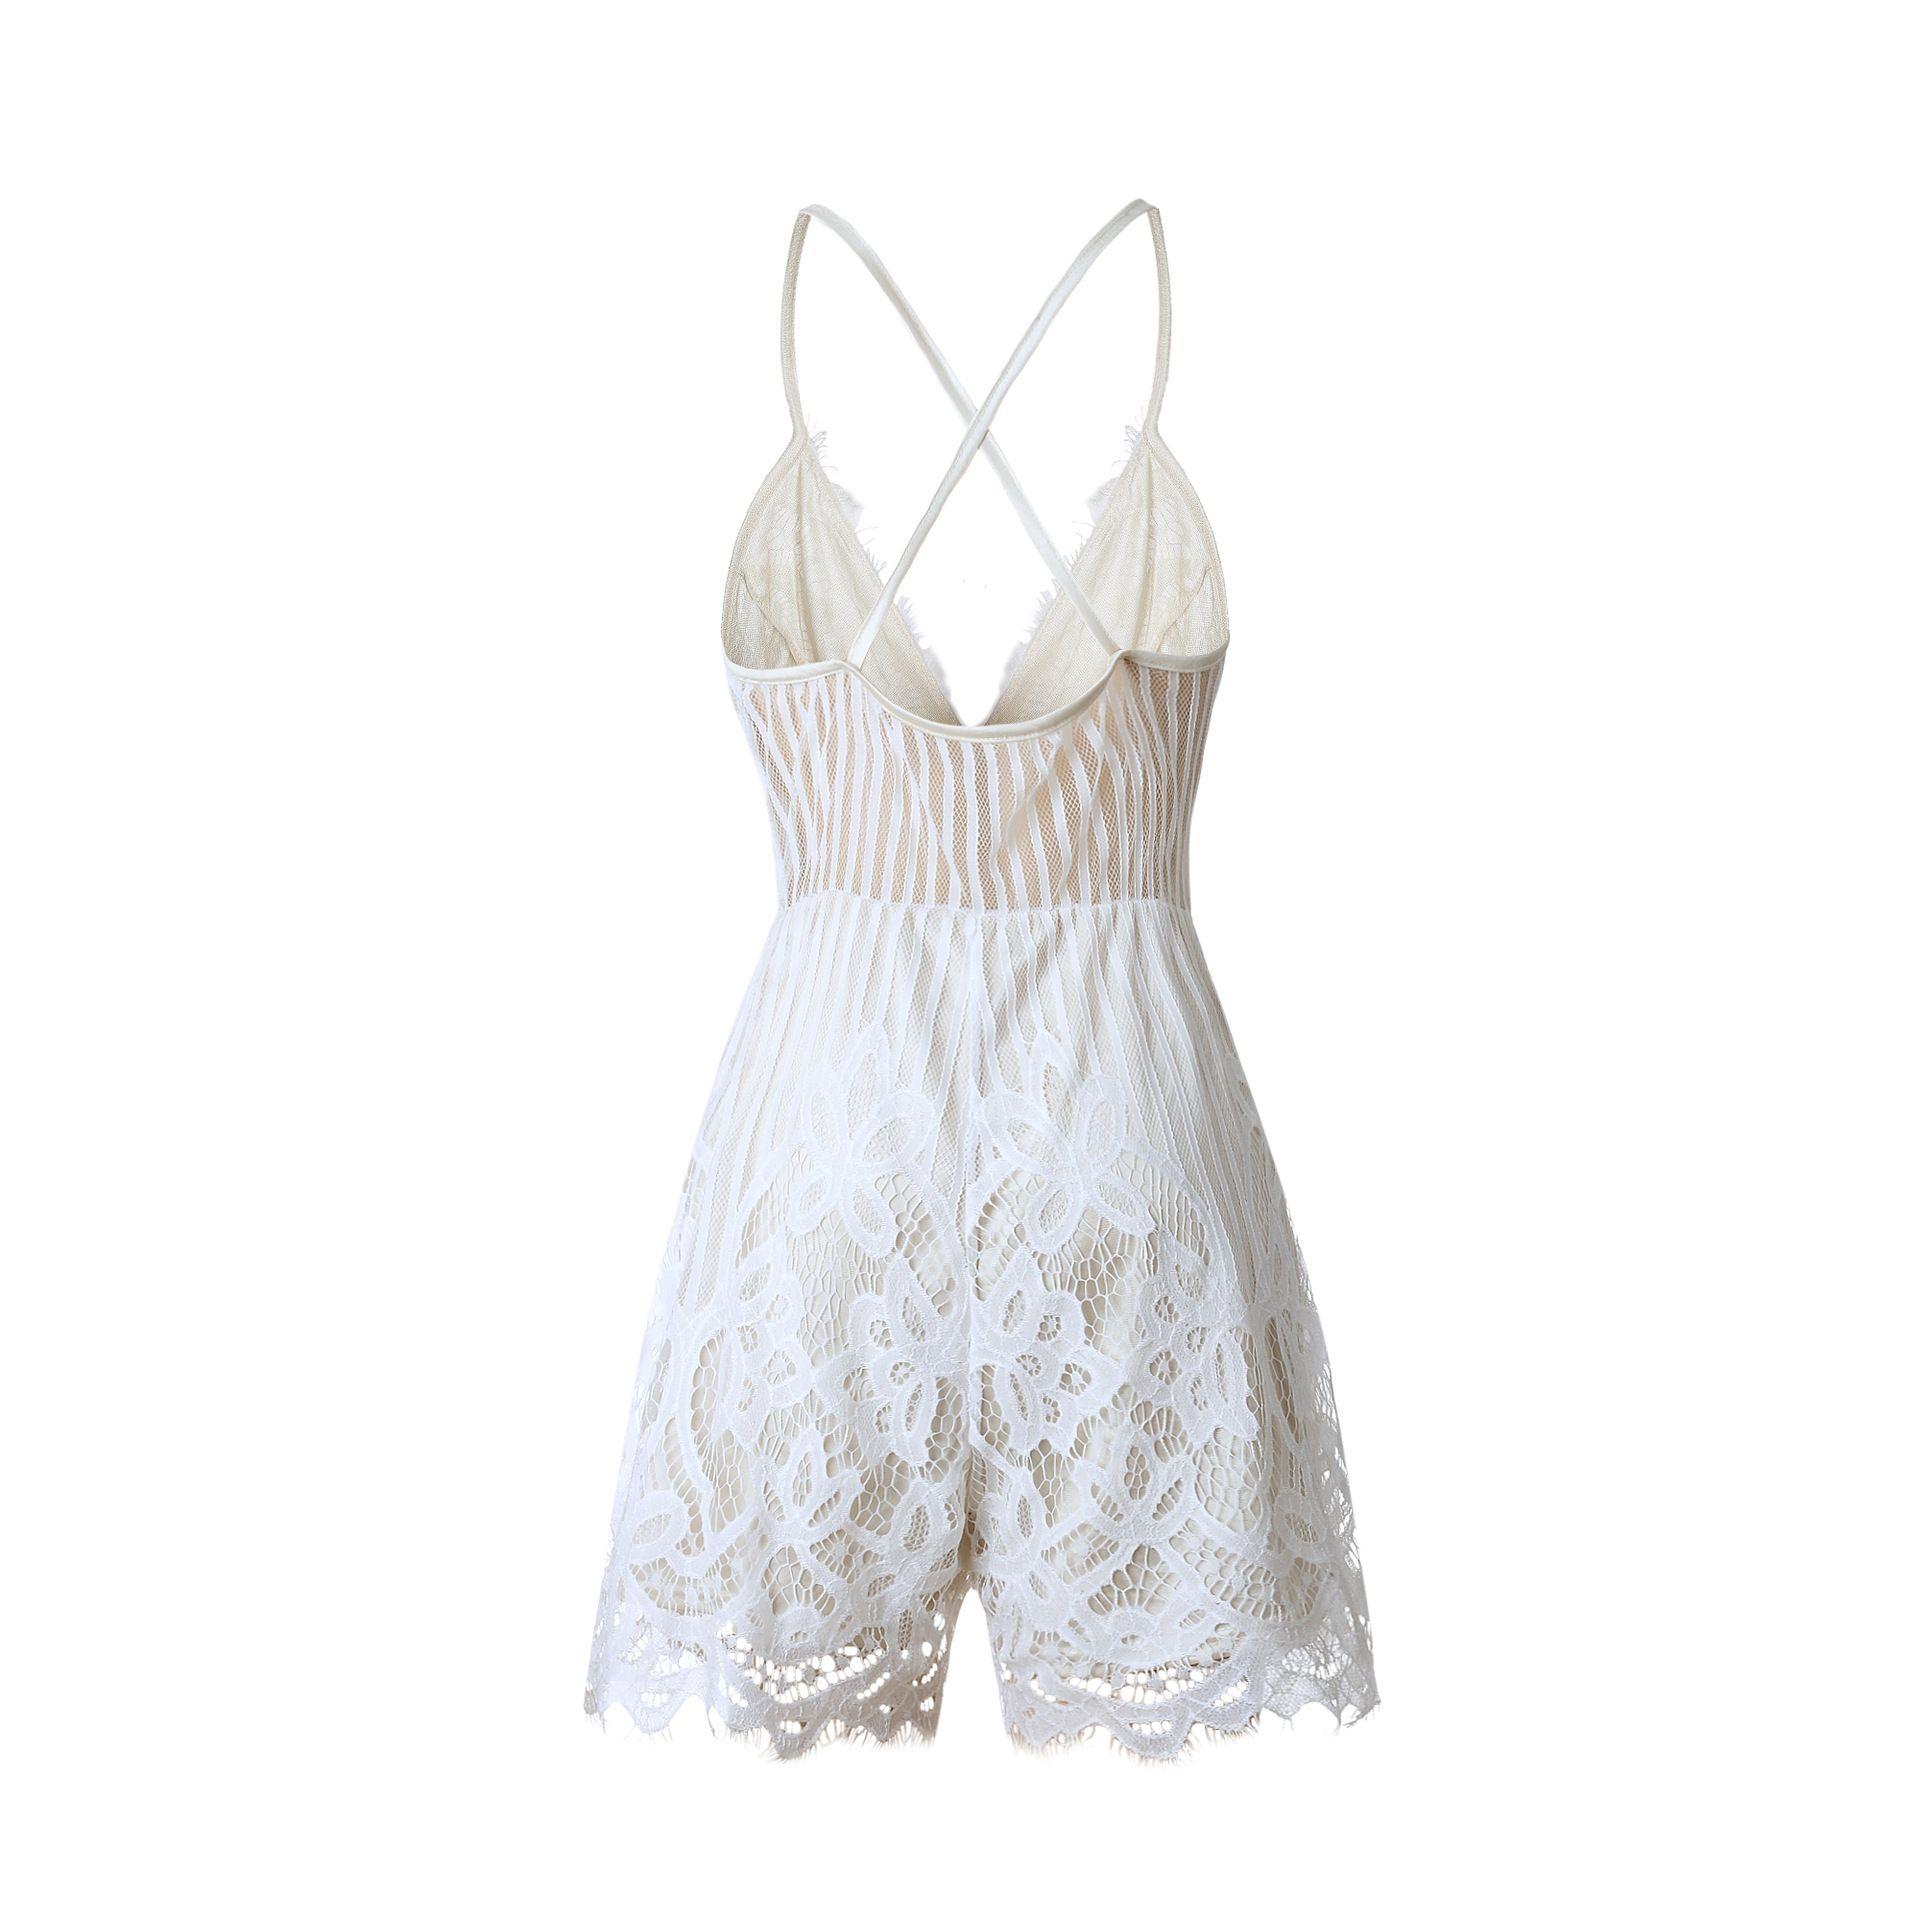 Ladies Cami Spaghetti Strap Pullover Lace Smocked Summer V-Neck Sleeveless Romper Womens V-Neck Playsuit Jumpsuit Crochet Siamese Shorts